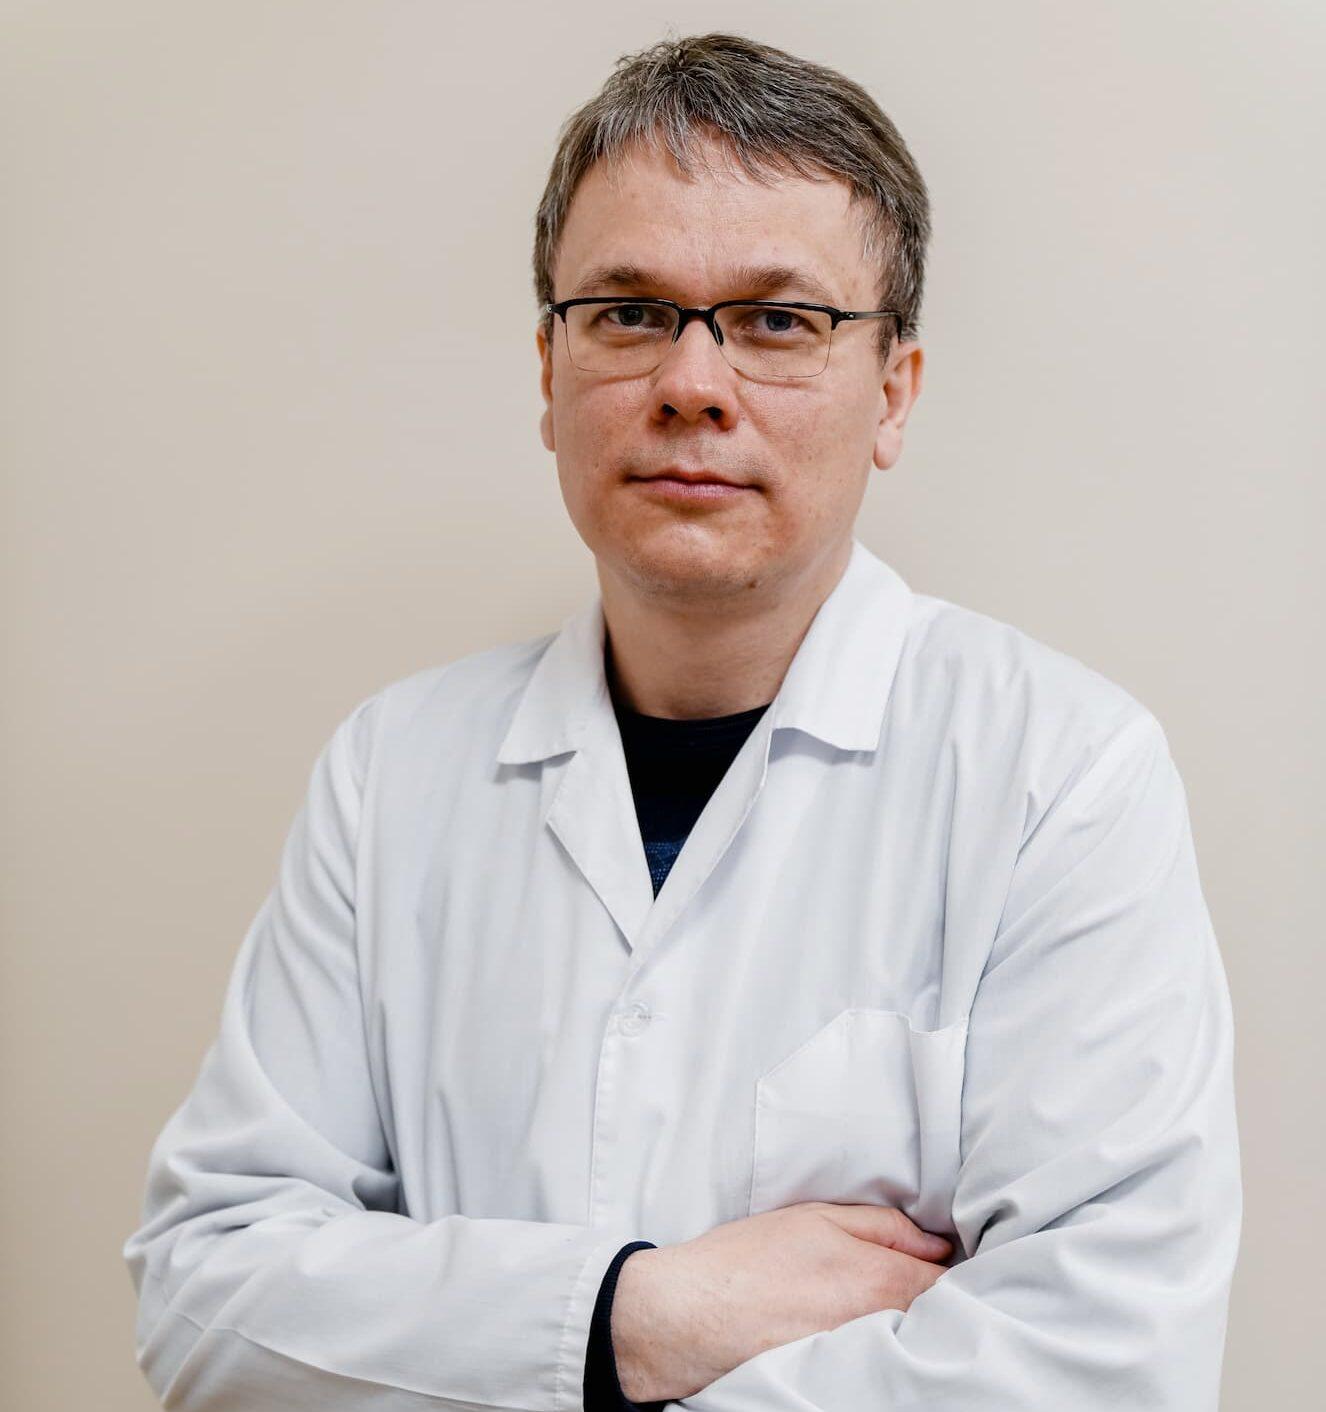 https://reutov.mrt-diomag.ru/wp-content/uploads/2021/03/rybin-e1616529597824.jpeg